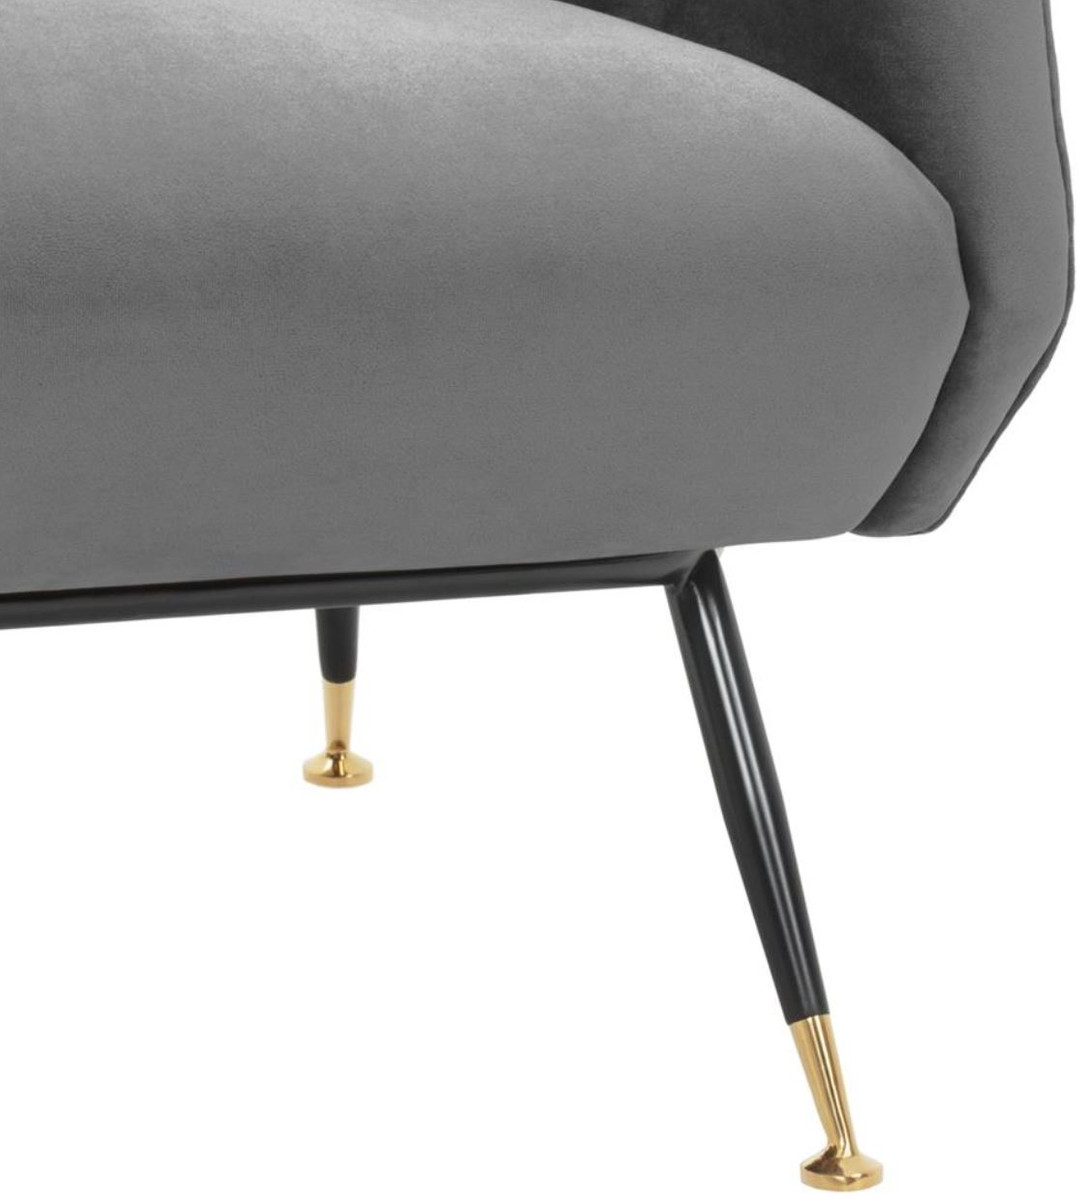 Casa Padrino Luxus Salon Sessel Grau / Schwarz / Messing 75 x 75 x H. 78 cm - Hotel Möbel 6